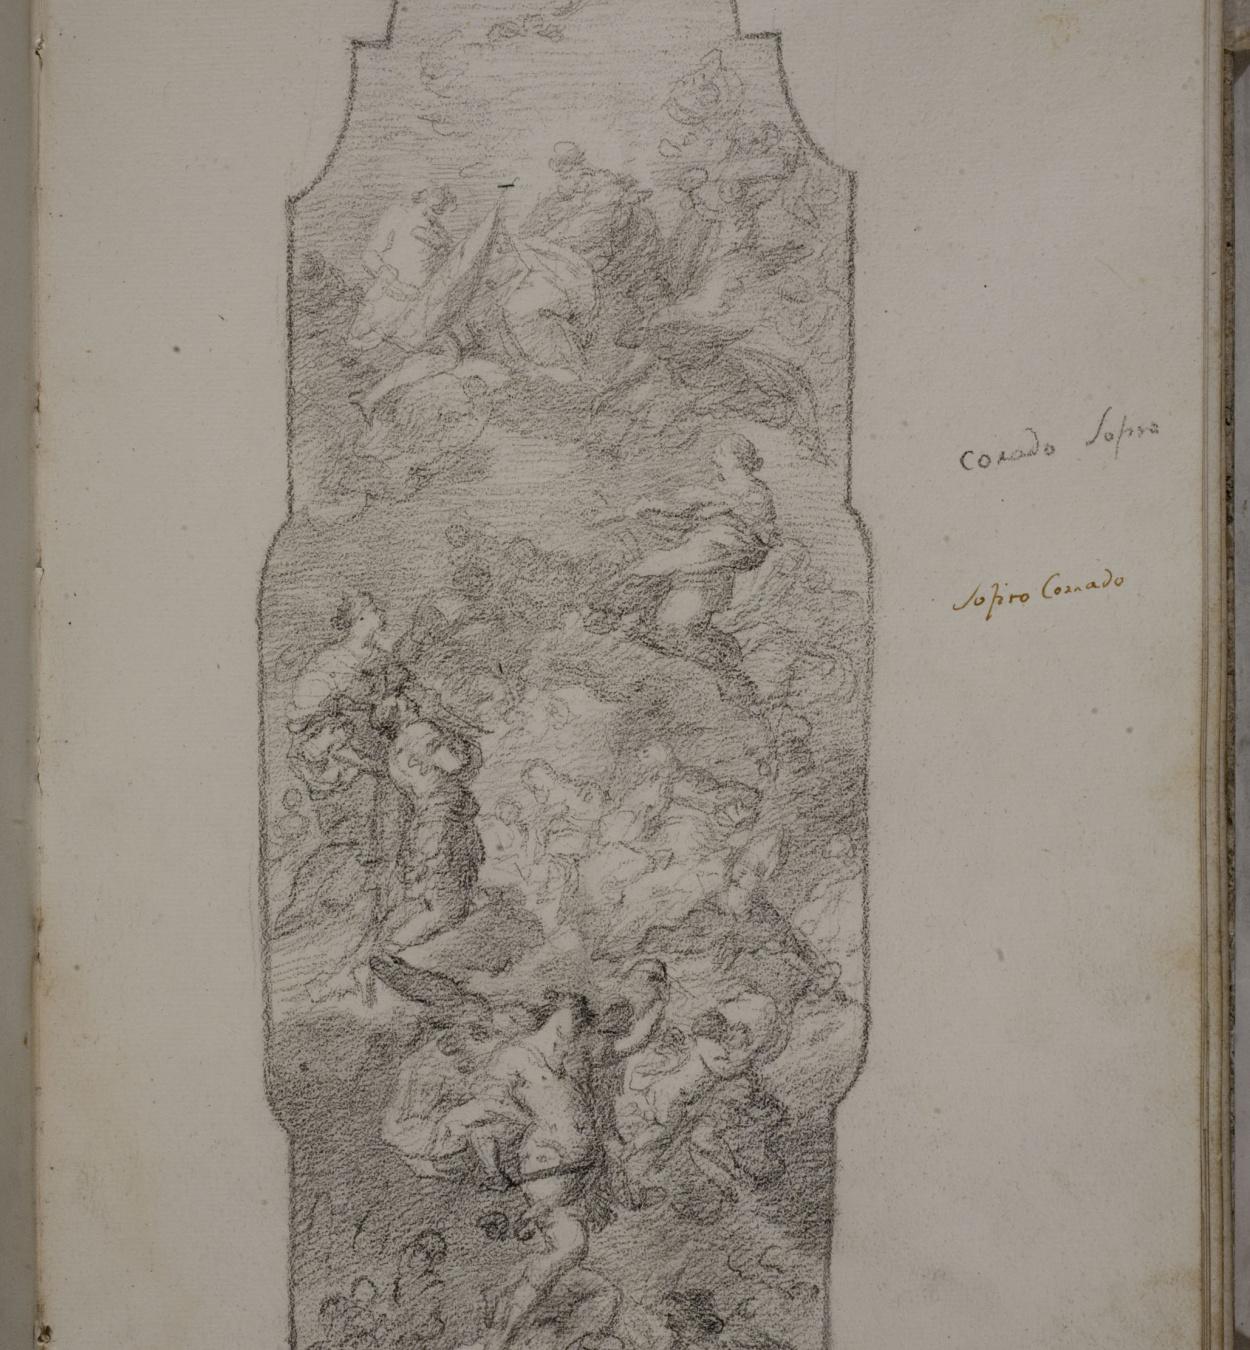 Domingo Álvarez Enciso - Roman album - Circa 1758-1762 or 1773-1789 [1]